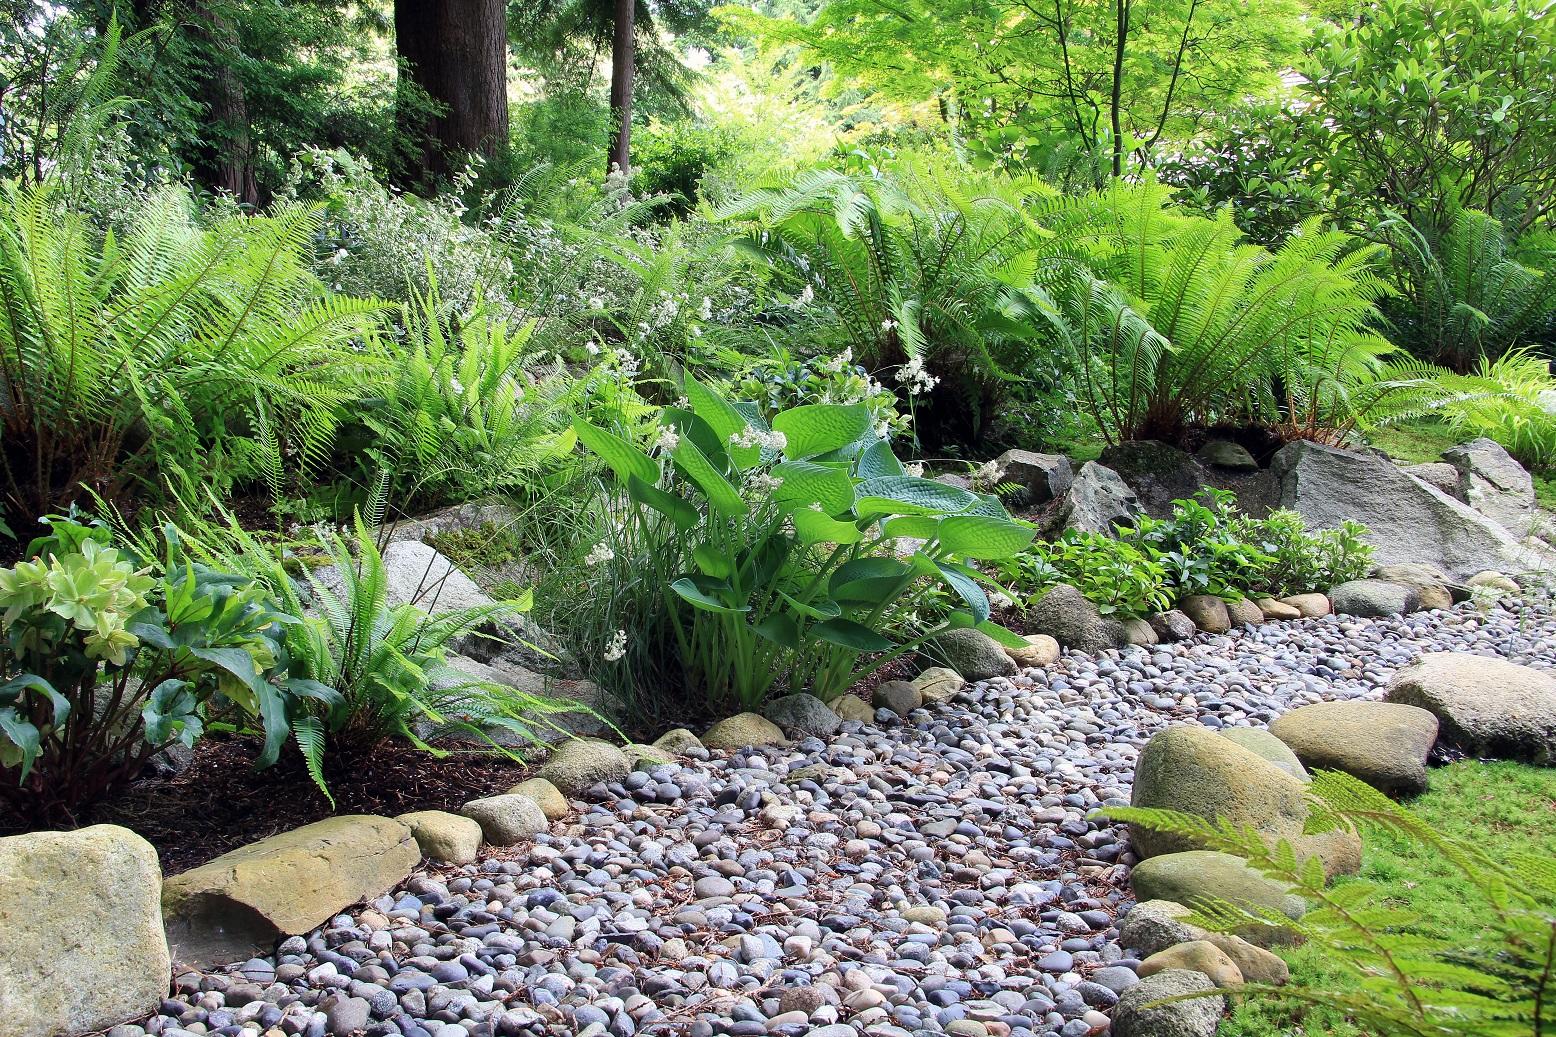 Arredare il giardino - giardino zen giapponese